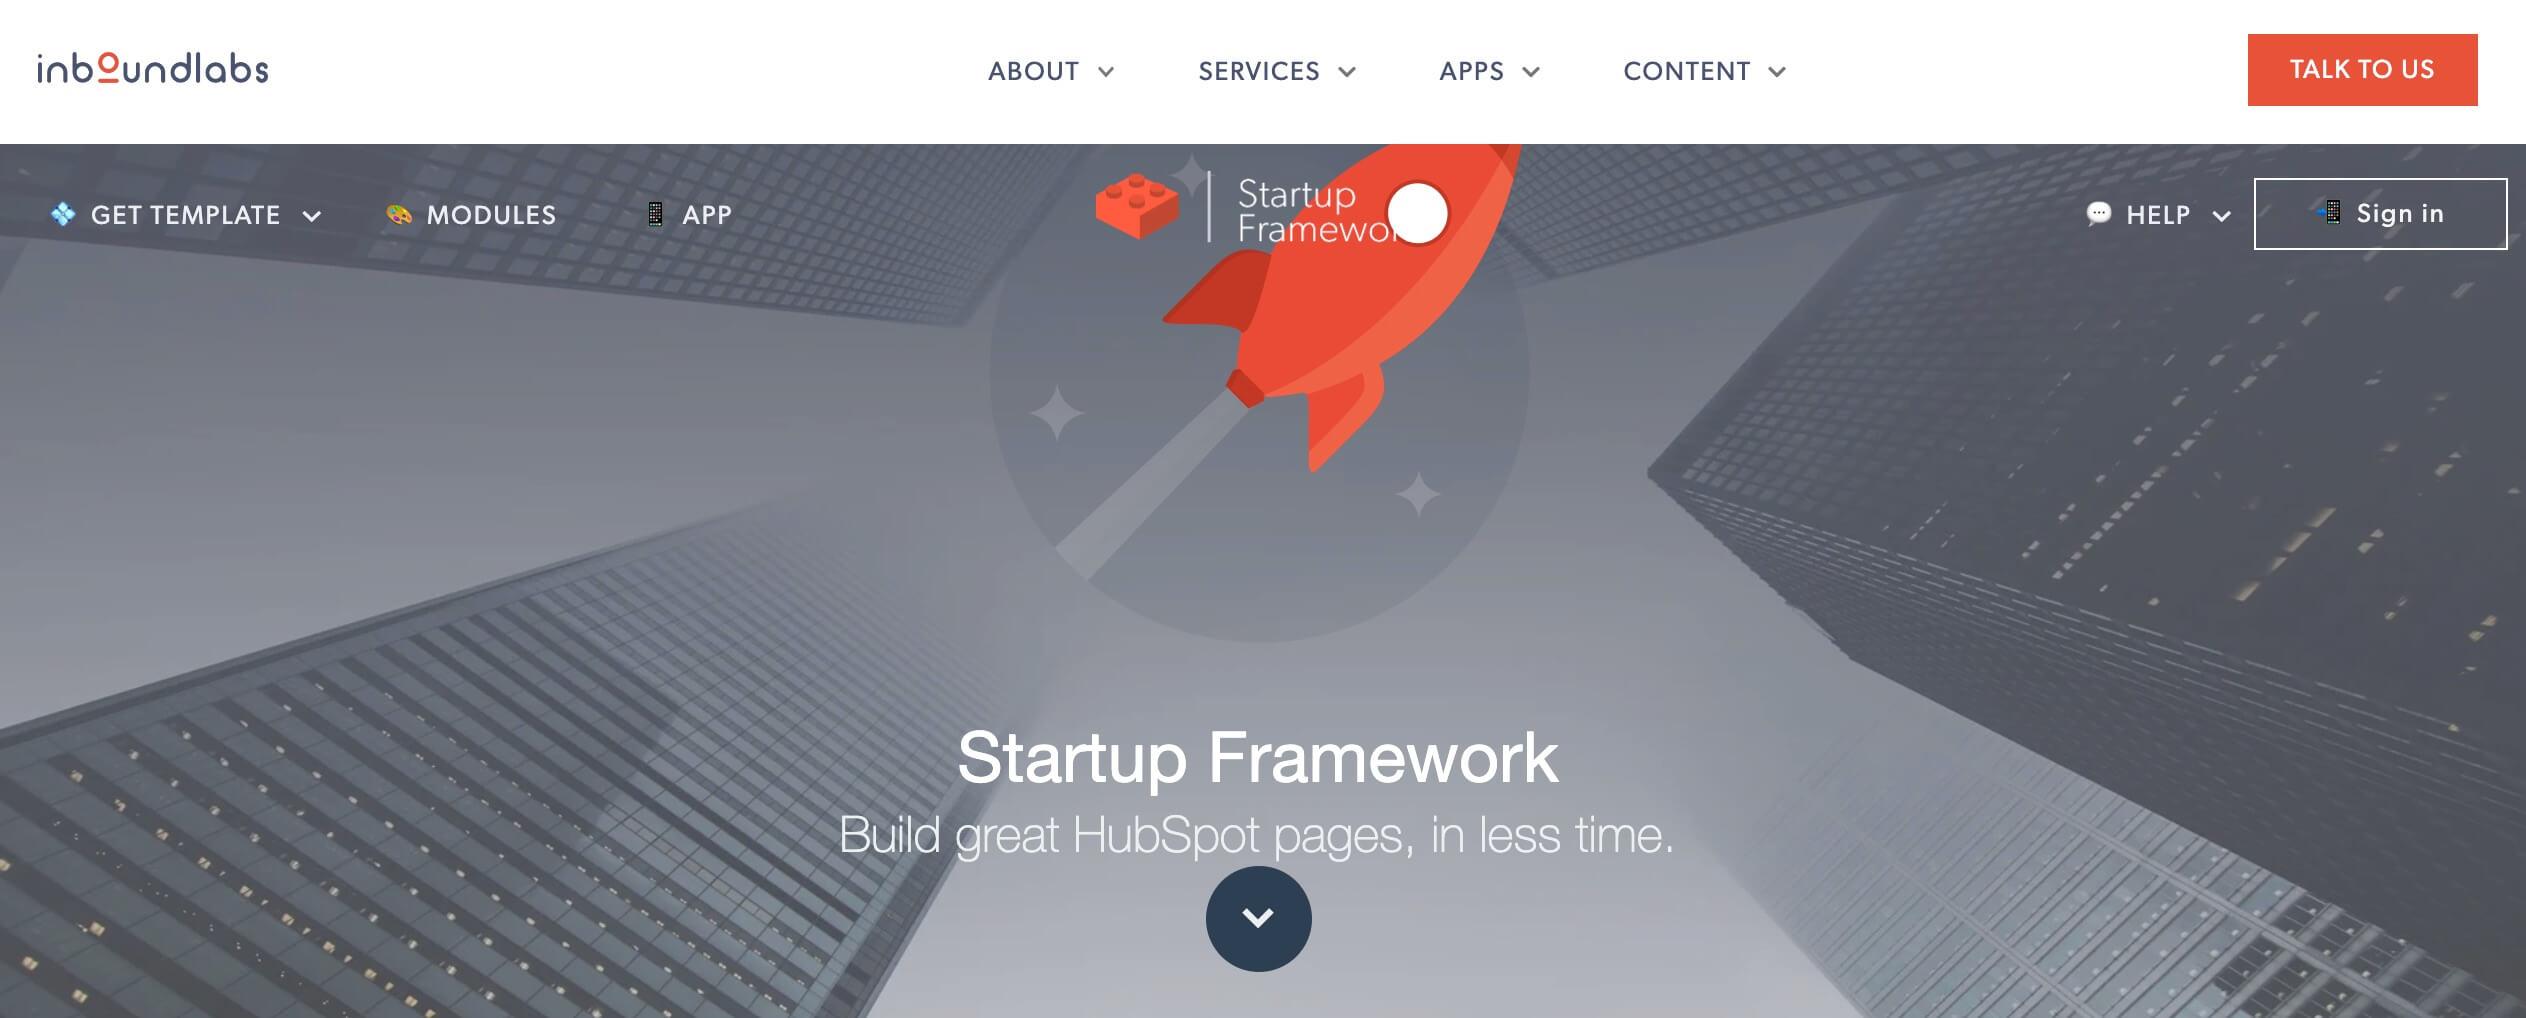 Startup Framework, tema responsive gratuito